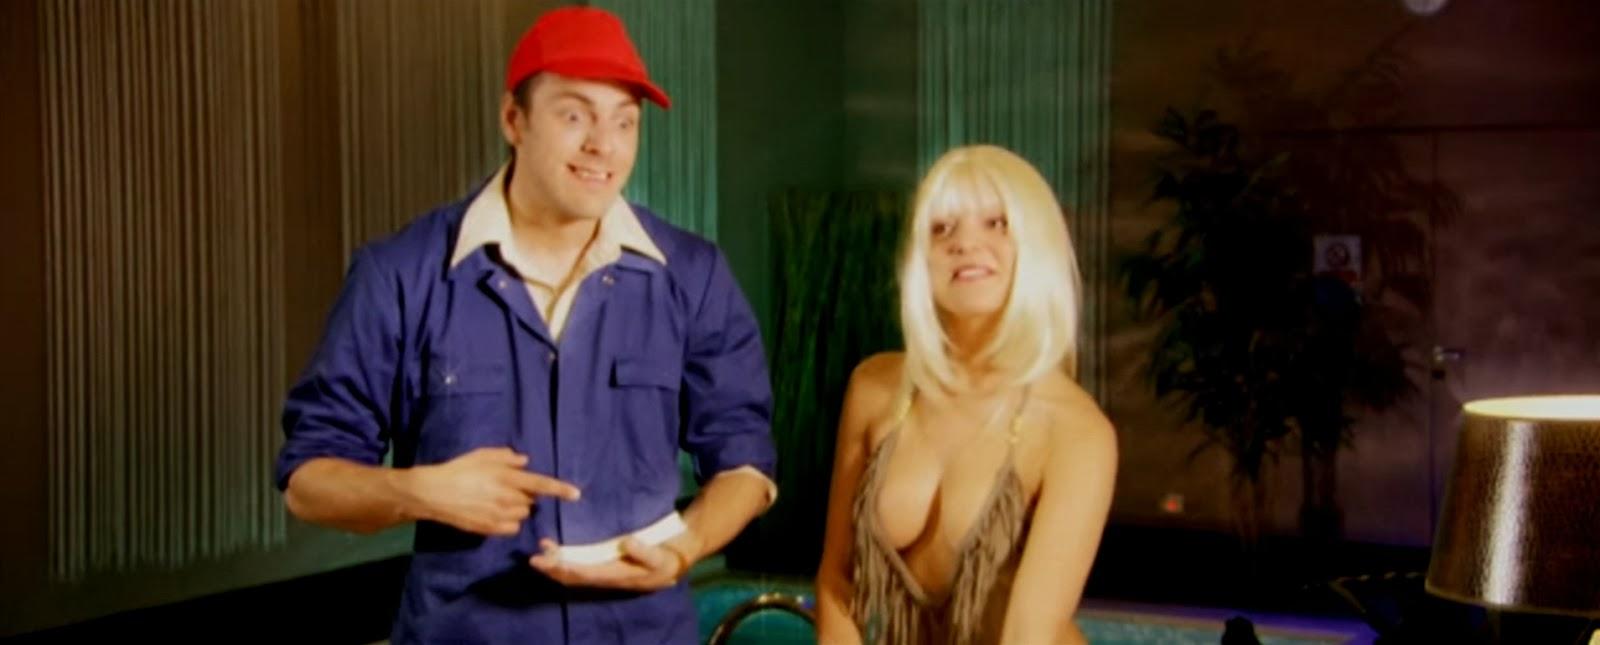 den beste sex smøremiddel bongacams leve